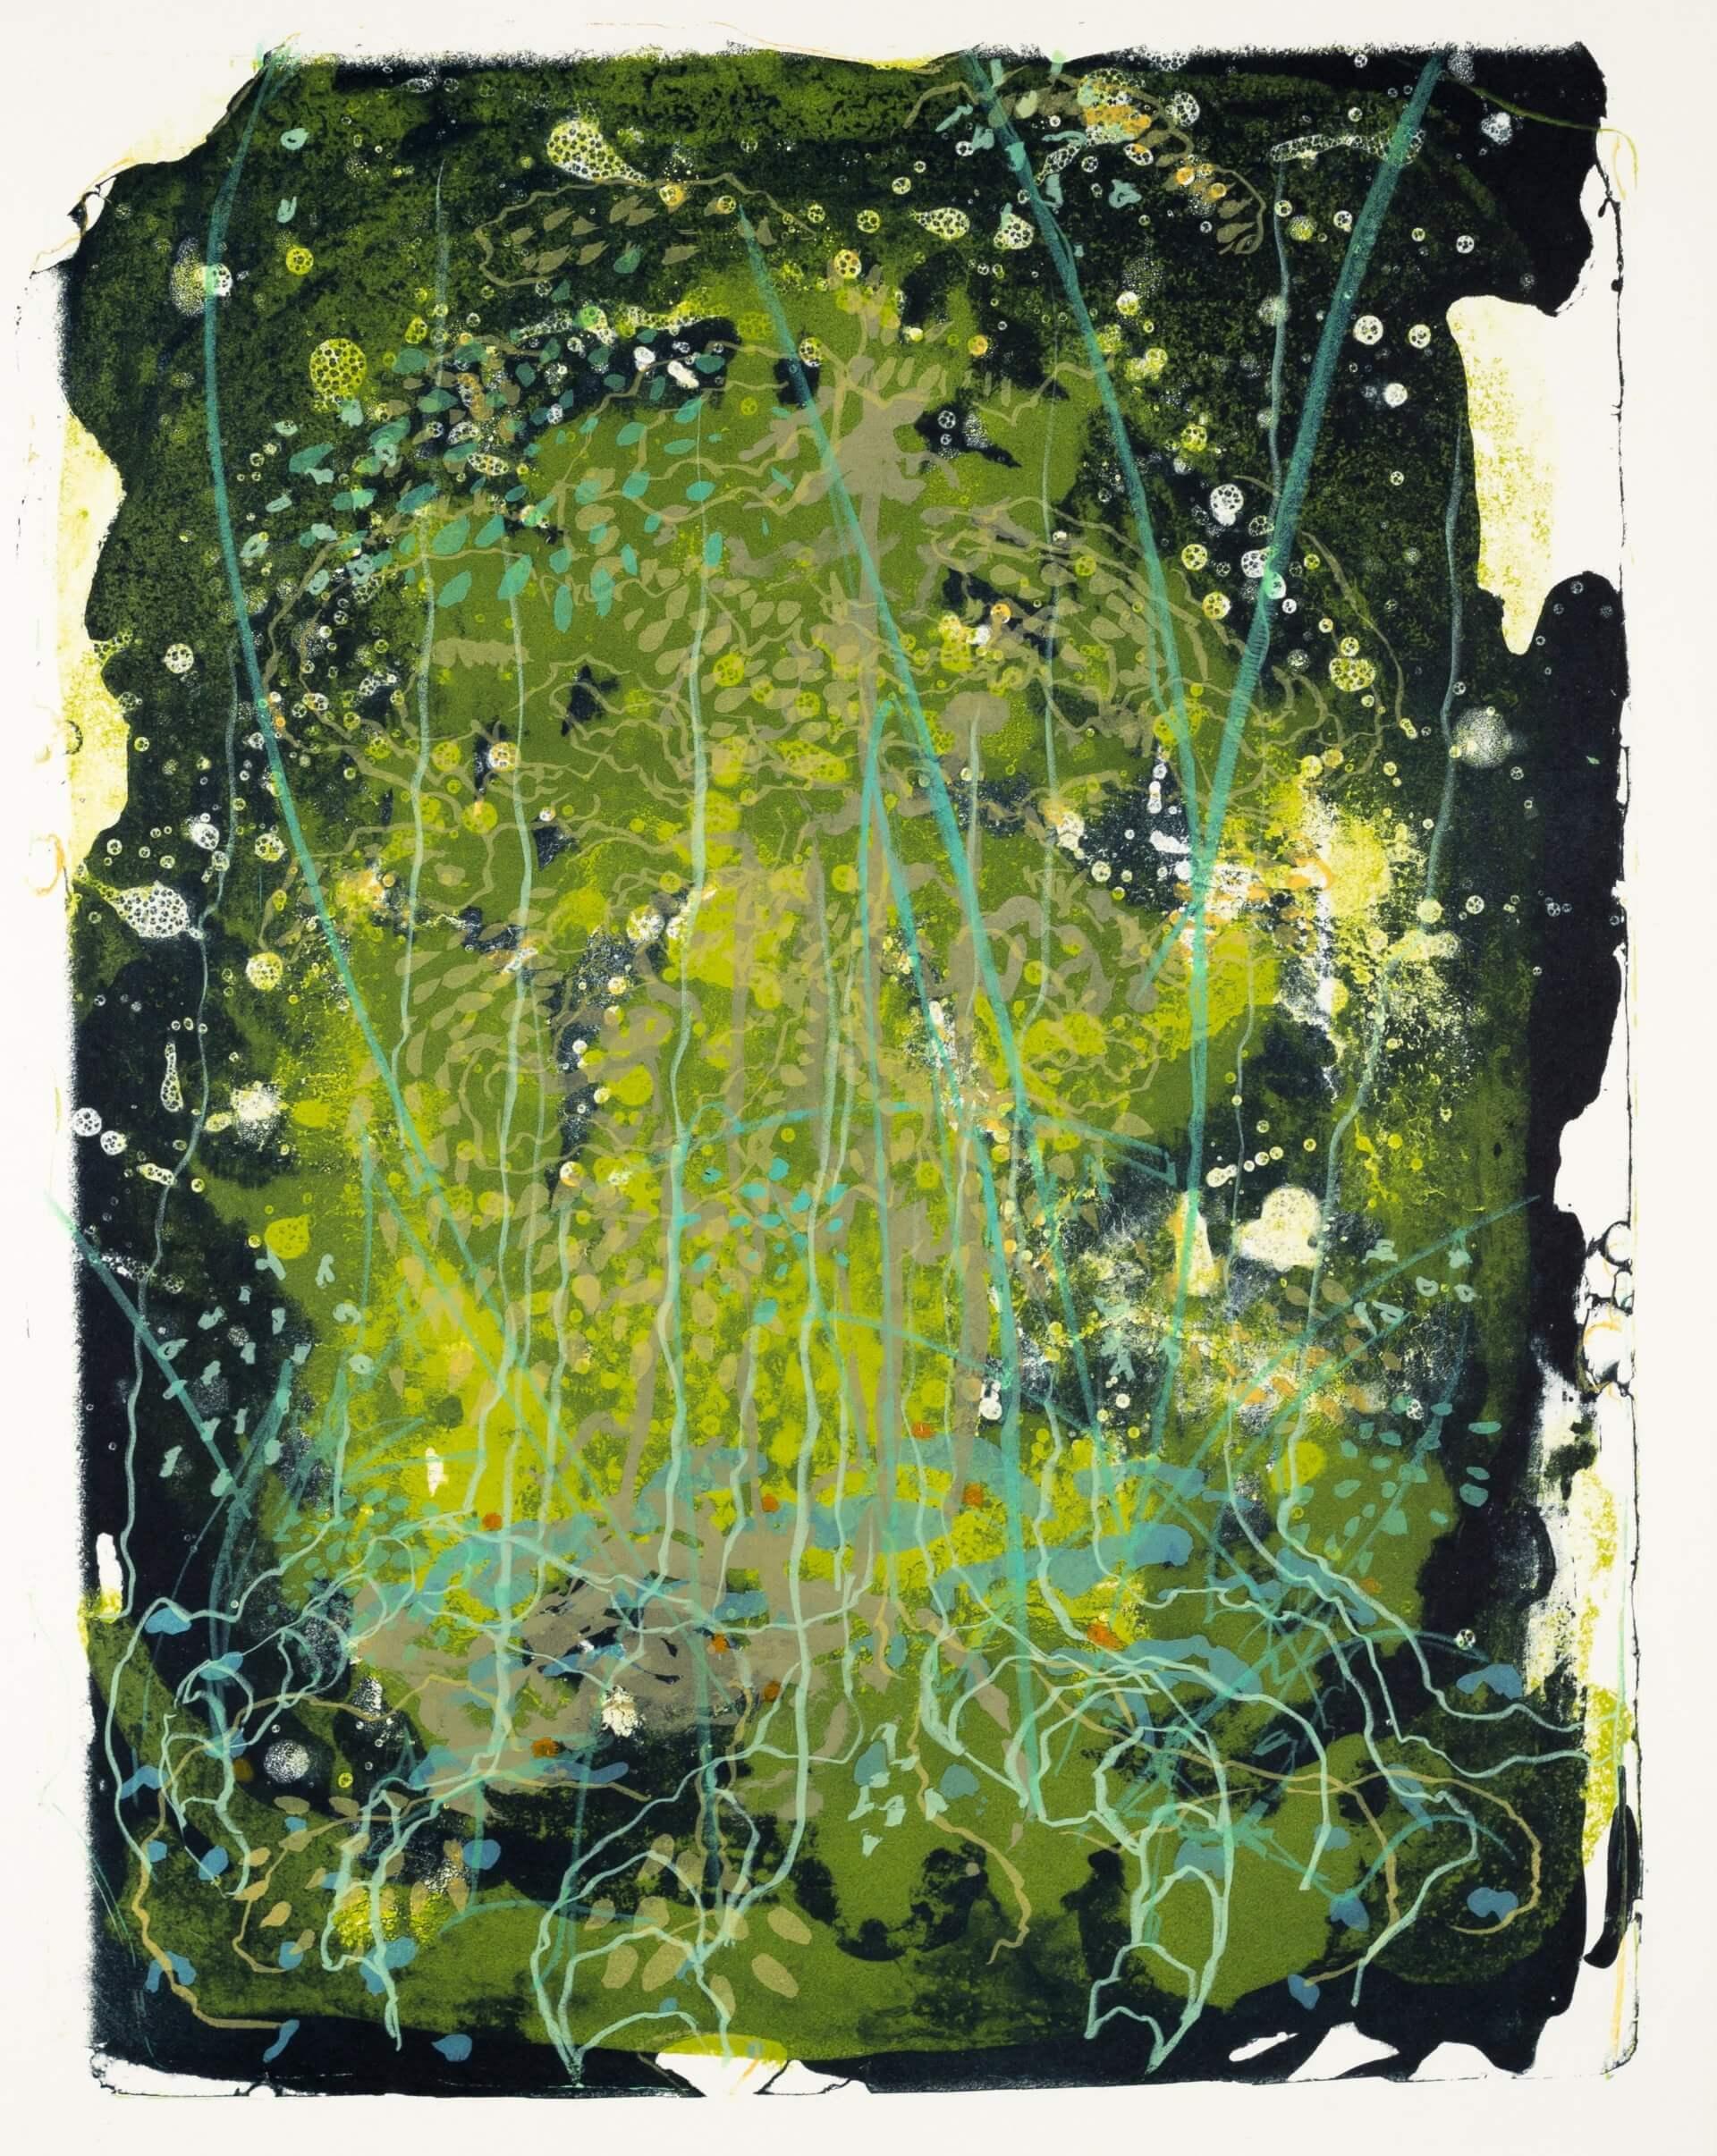 Wald X(D)-XI, 2019, Farblithographie, Unikat, 50x40 cm